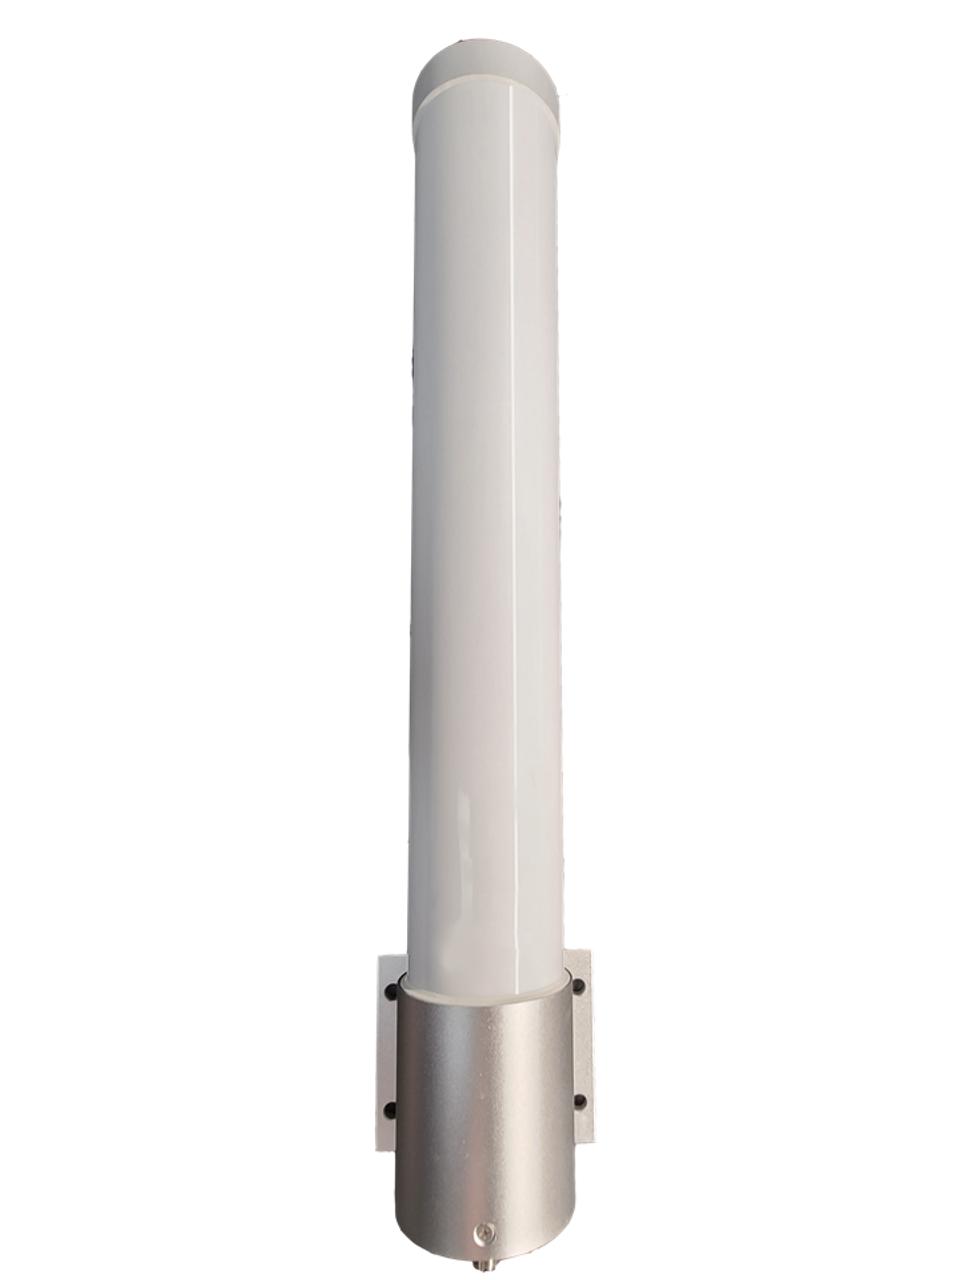 M25 Omni Directional 4G LTE CBRS 5G NR M2M IOT Antenna for Verizon Novatel Jetpack MiFi 7730L